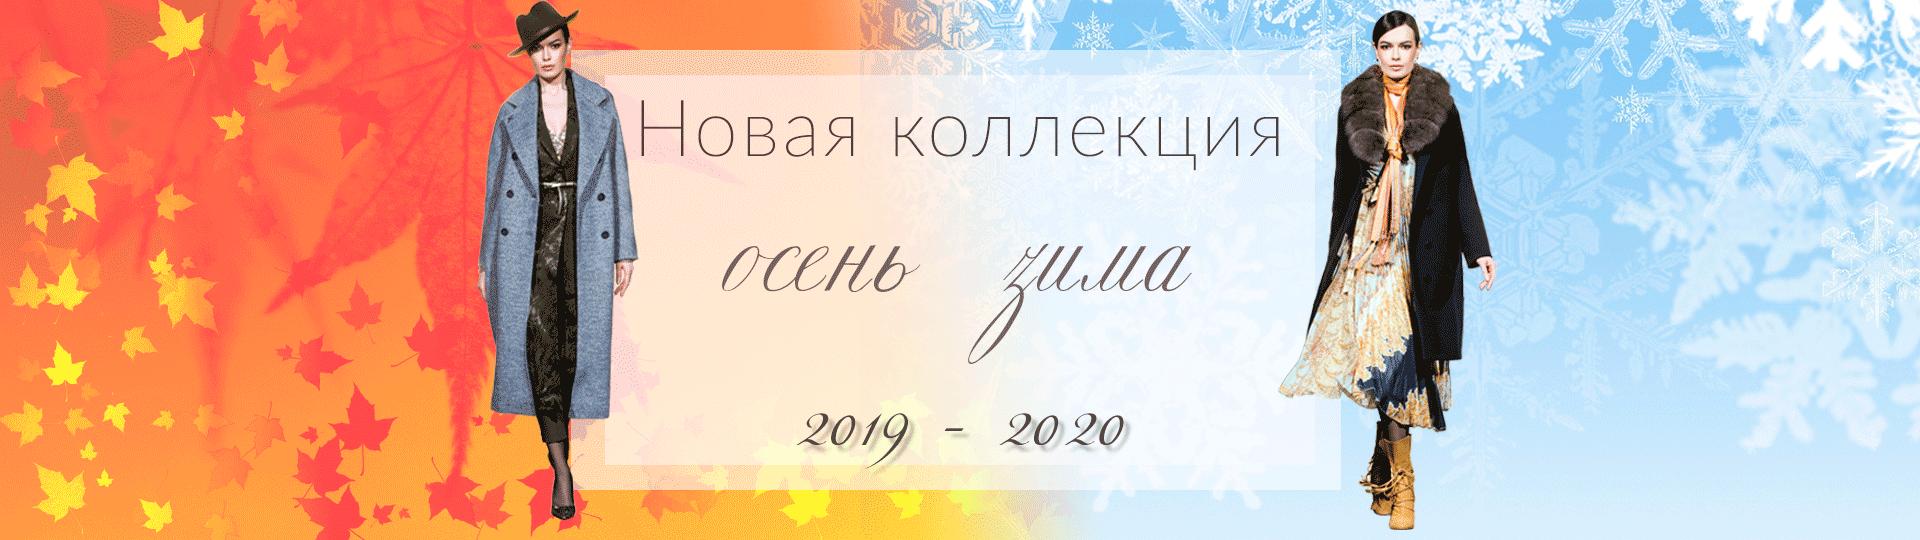 banner19-2020